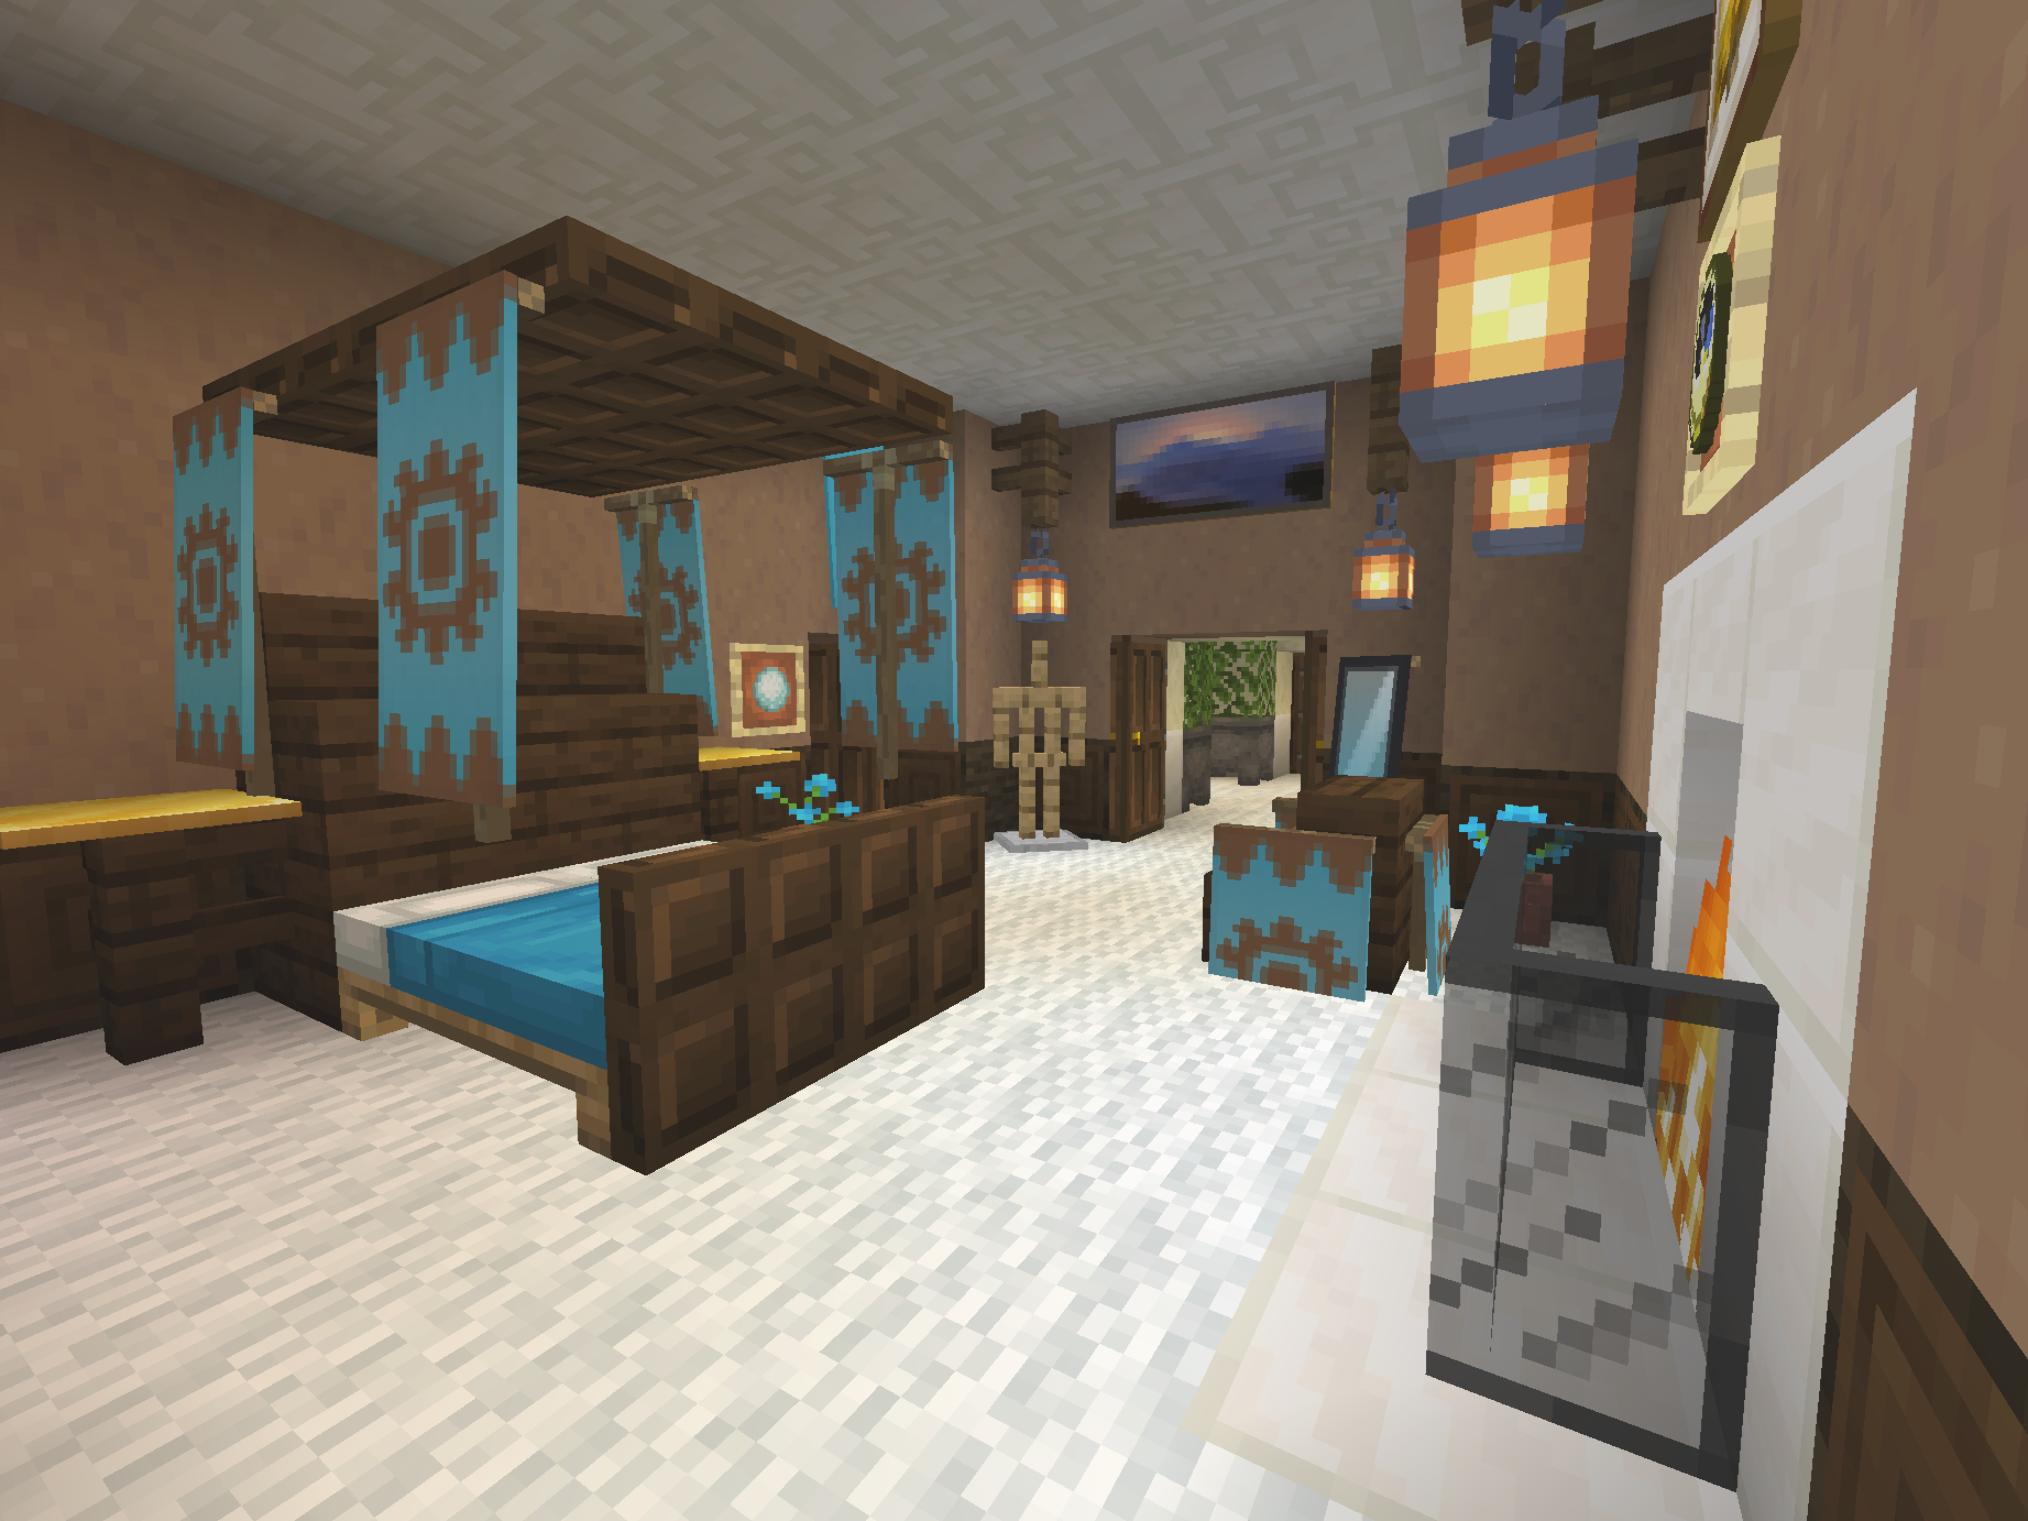 Minecraft House Ideas You Can Use To Build Effortlessly Minecraft Bedroom Decor Minecraft Room Decor Minecraft Interior Design